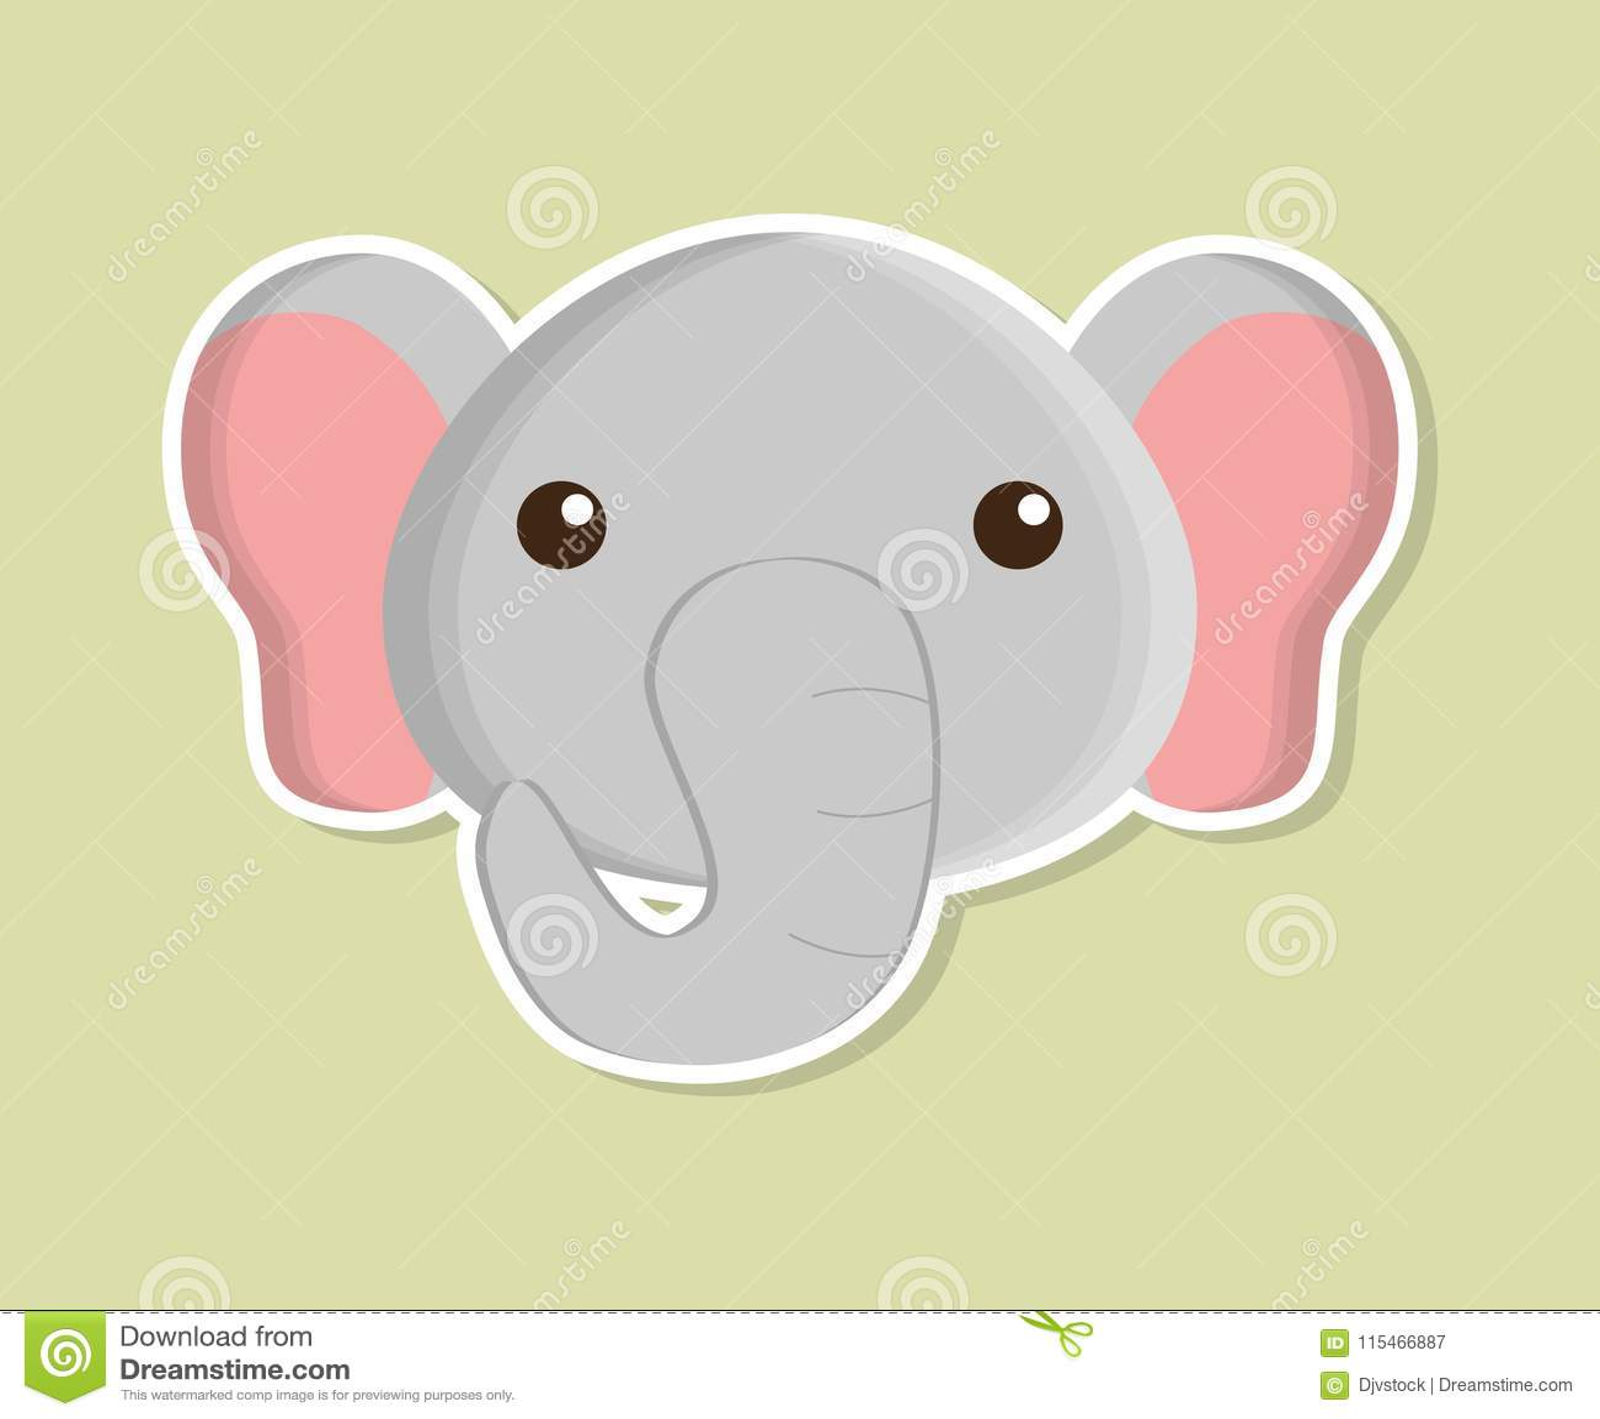 c584c01a634df Elephant Animal Cute Little Design. Stock Vector - Illustration of ...